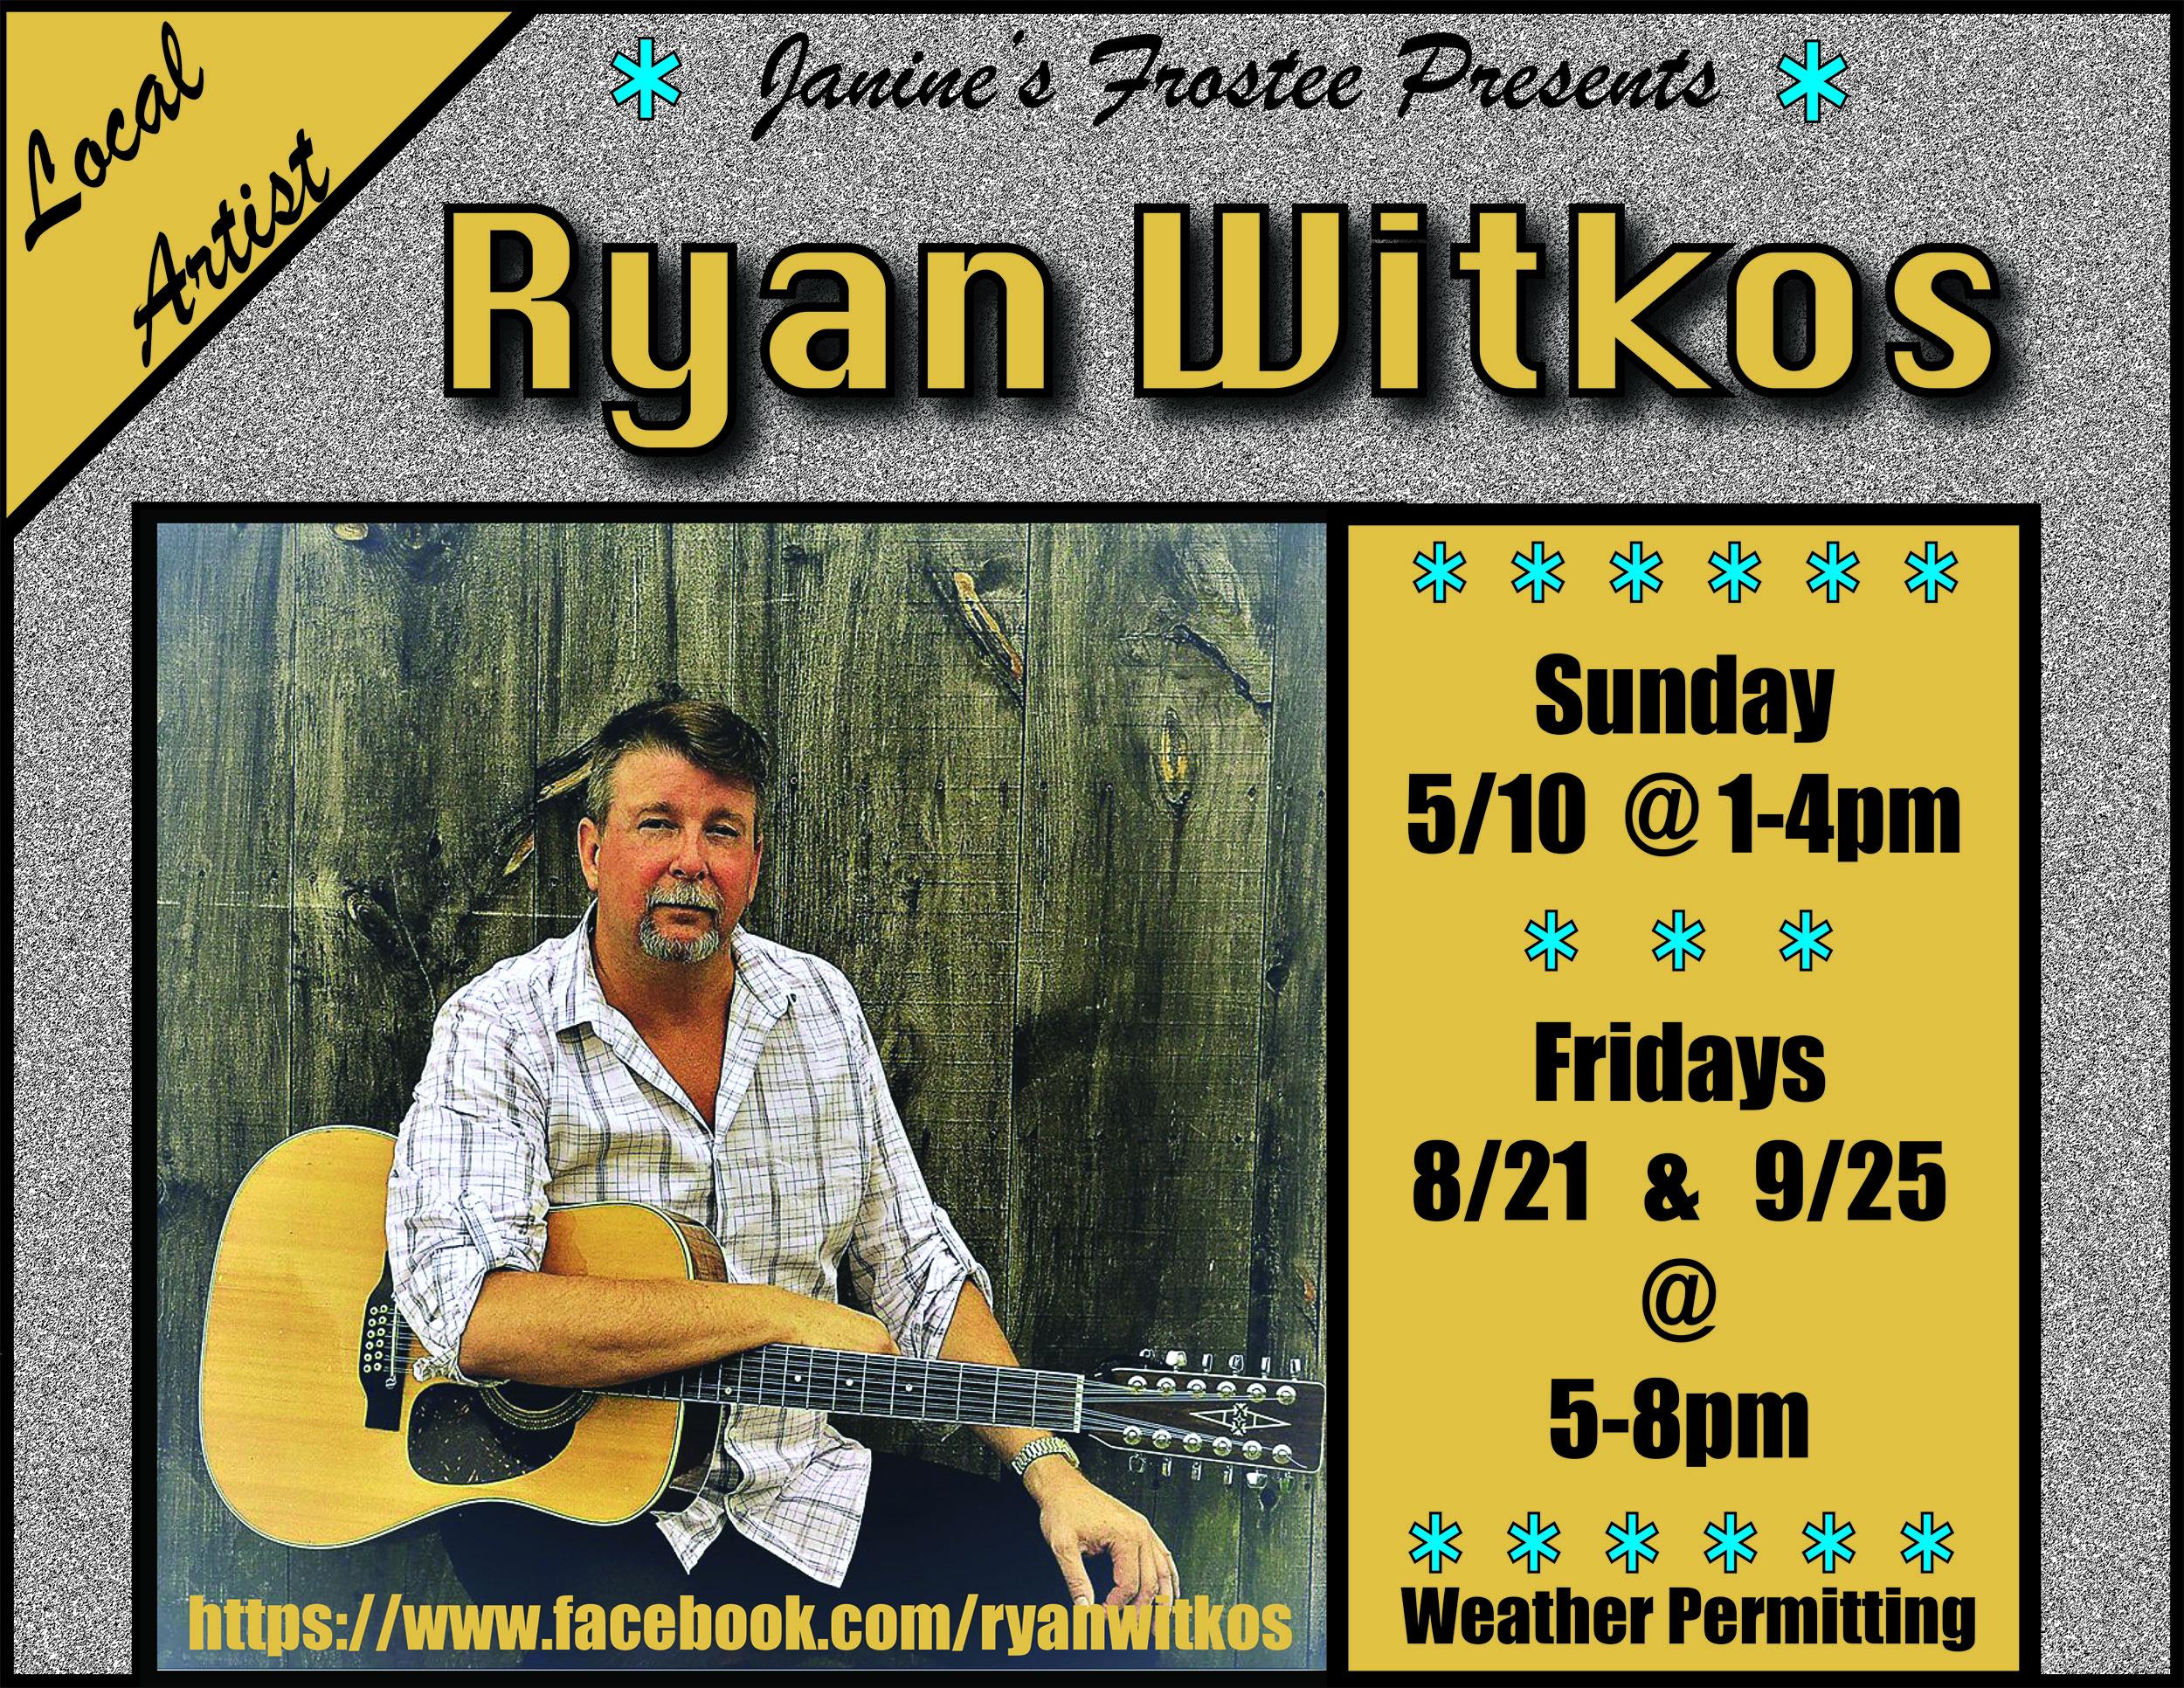 Ryan Witkos @ Janine's Frostee